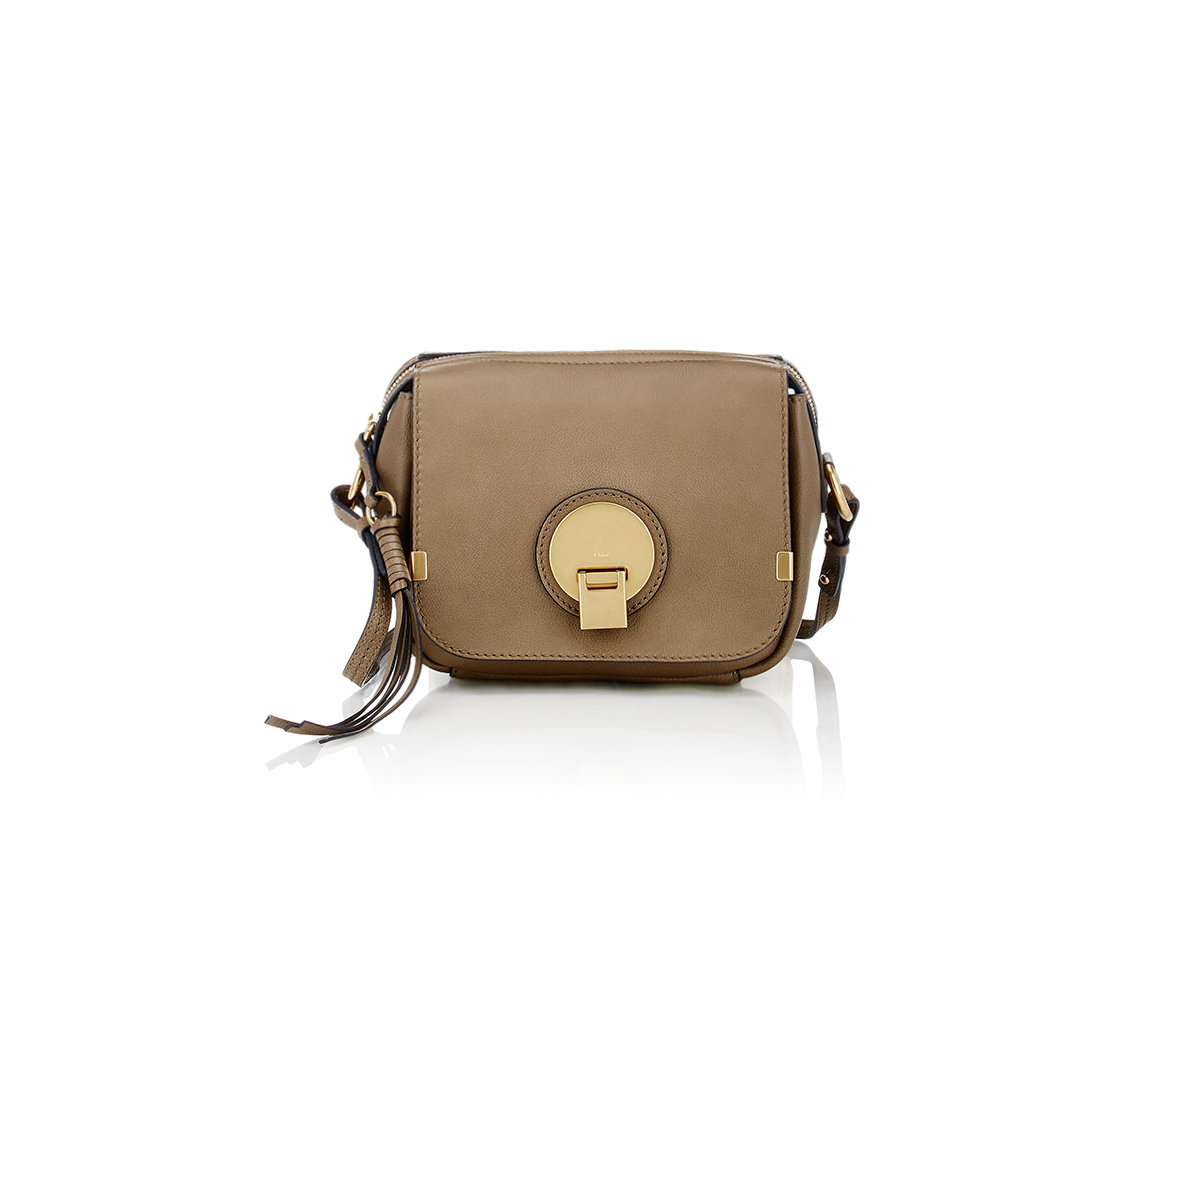 handbags chloe online - Chlo�� Women\u0026#39;s Indy Small Camera Bag in Gray (Grey) | Lyst